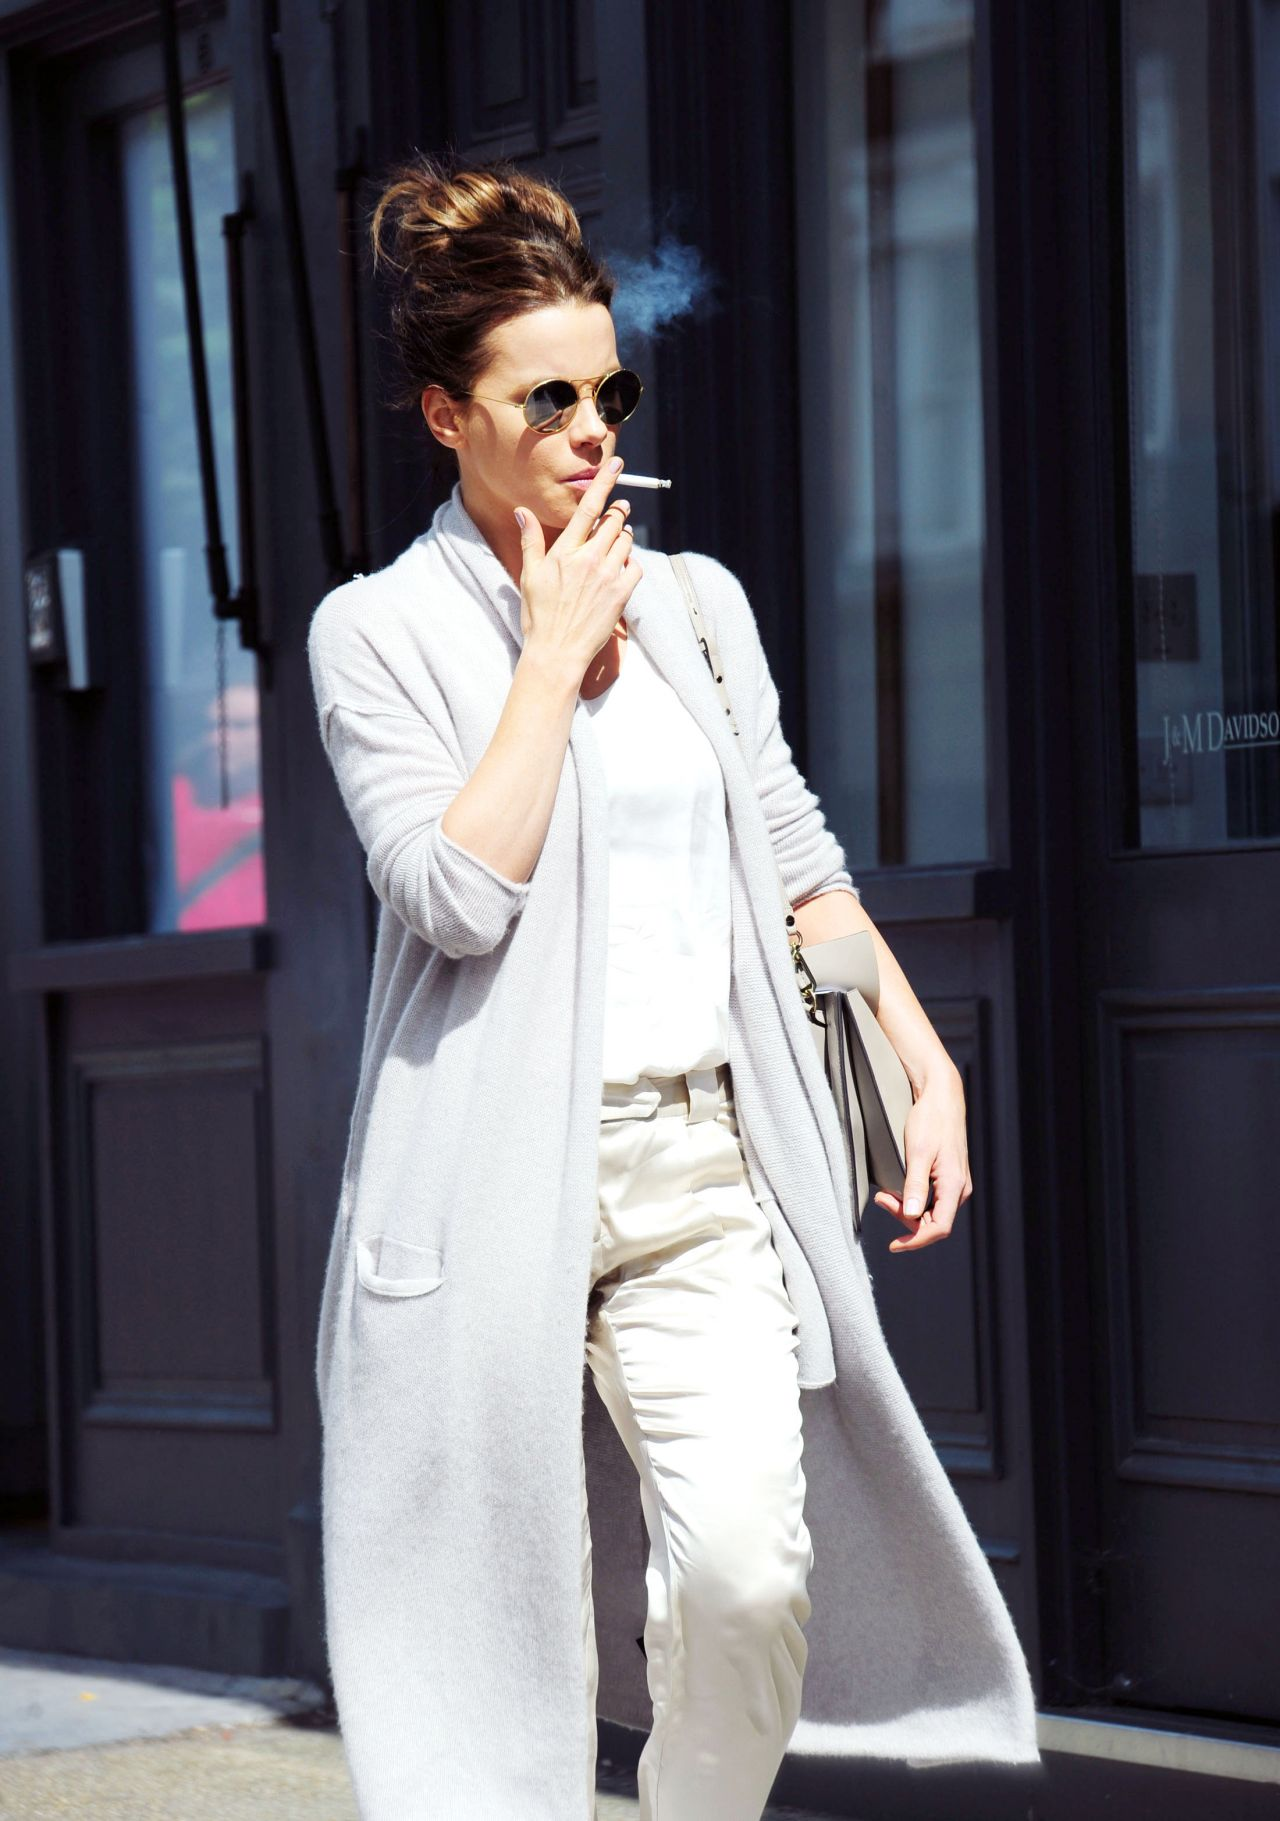 Kate Beckinsale Shoppingl In London 8 3 2016